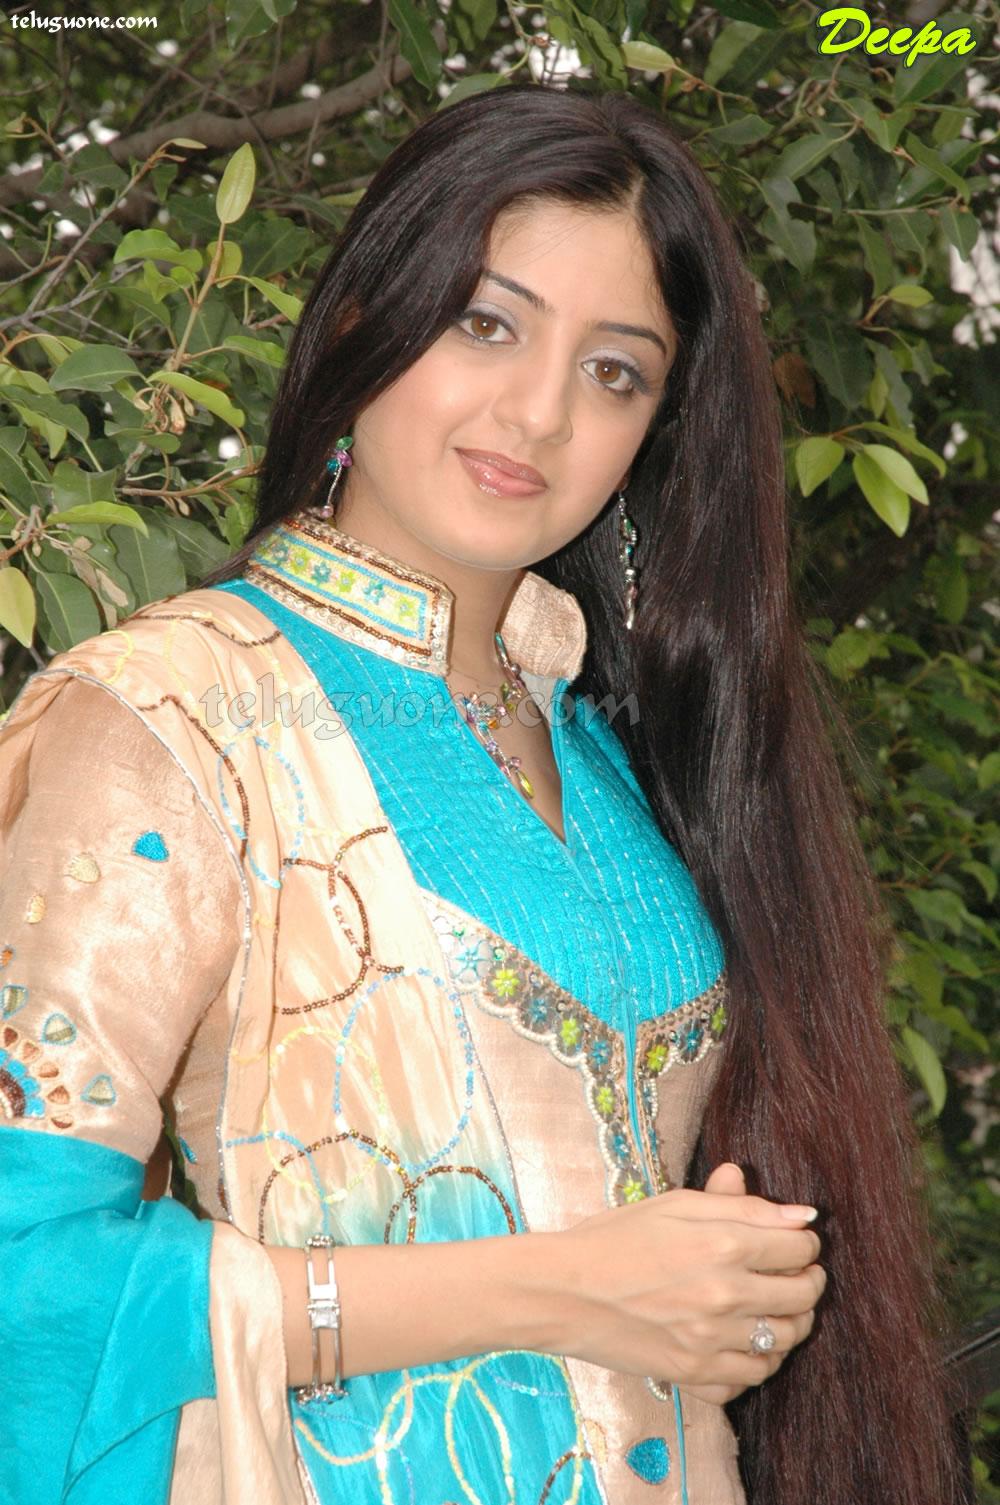 Desi Indian Hot bhabhi Nude Bhabhi Images – Desi kahani